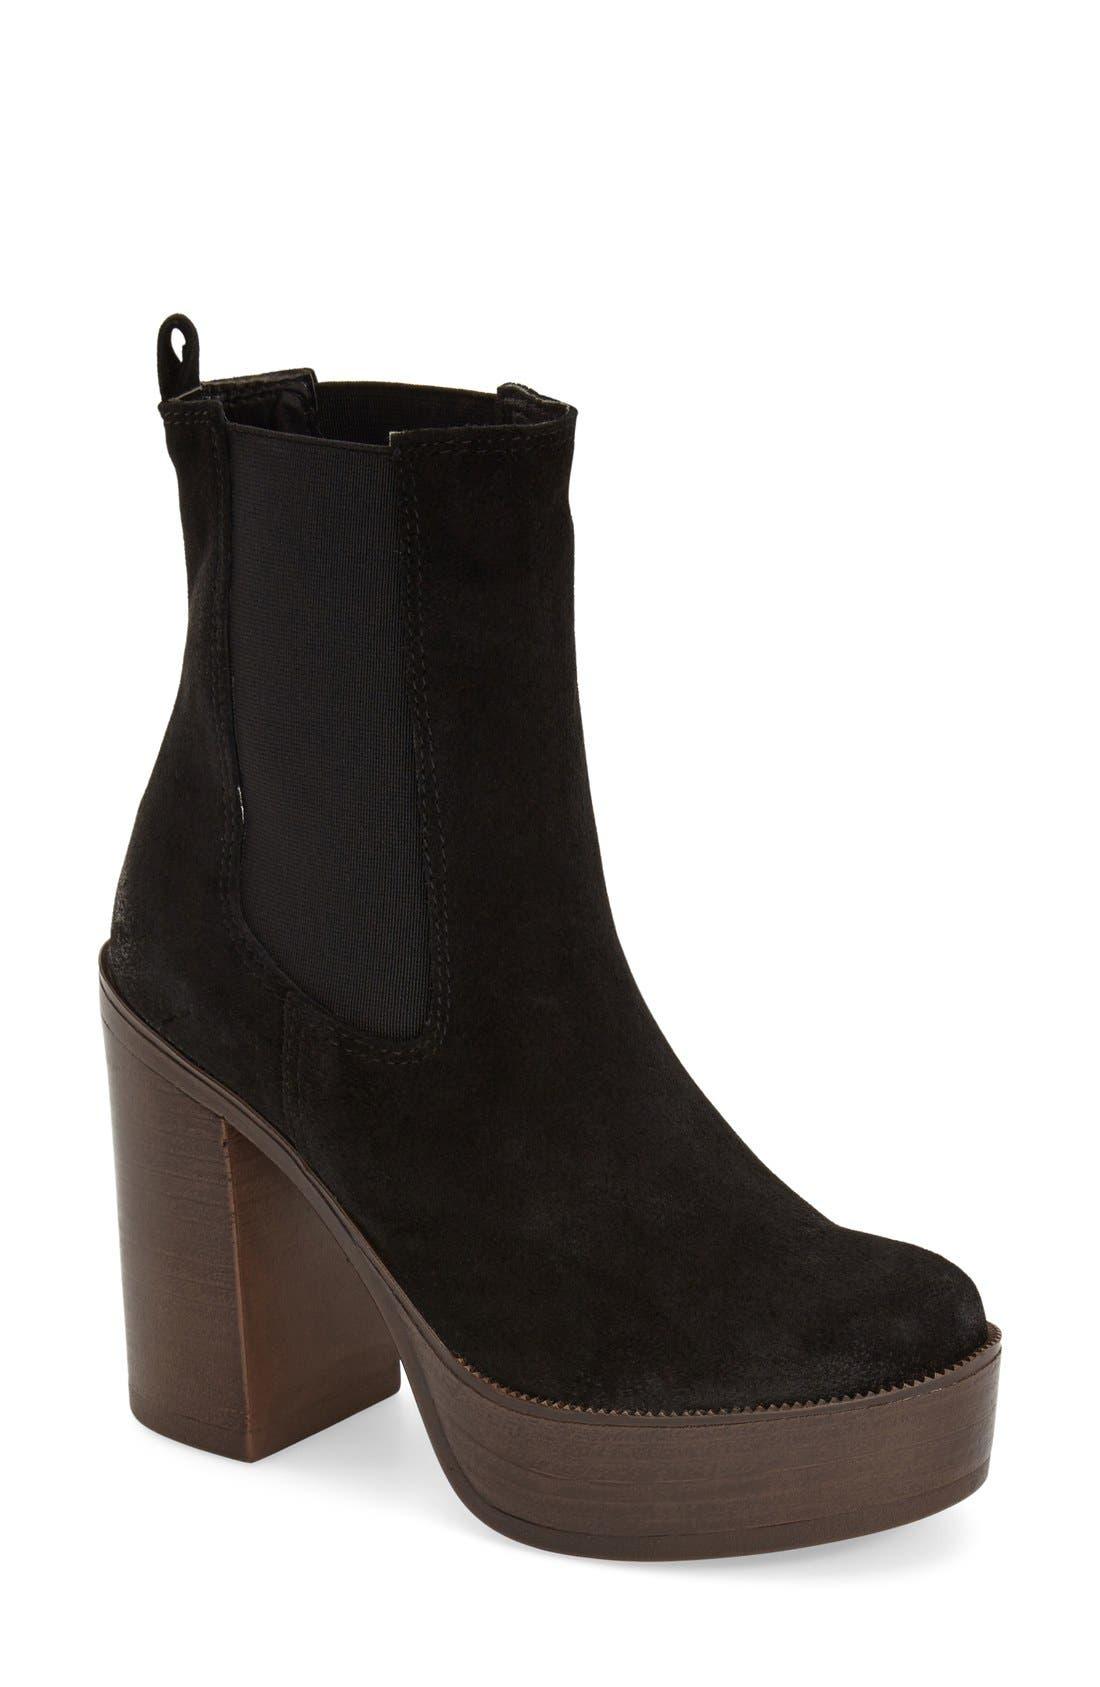 Main Image - Topshop 'Holly 70s' Platform Boot (Women)